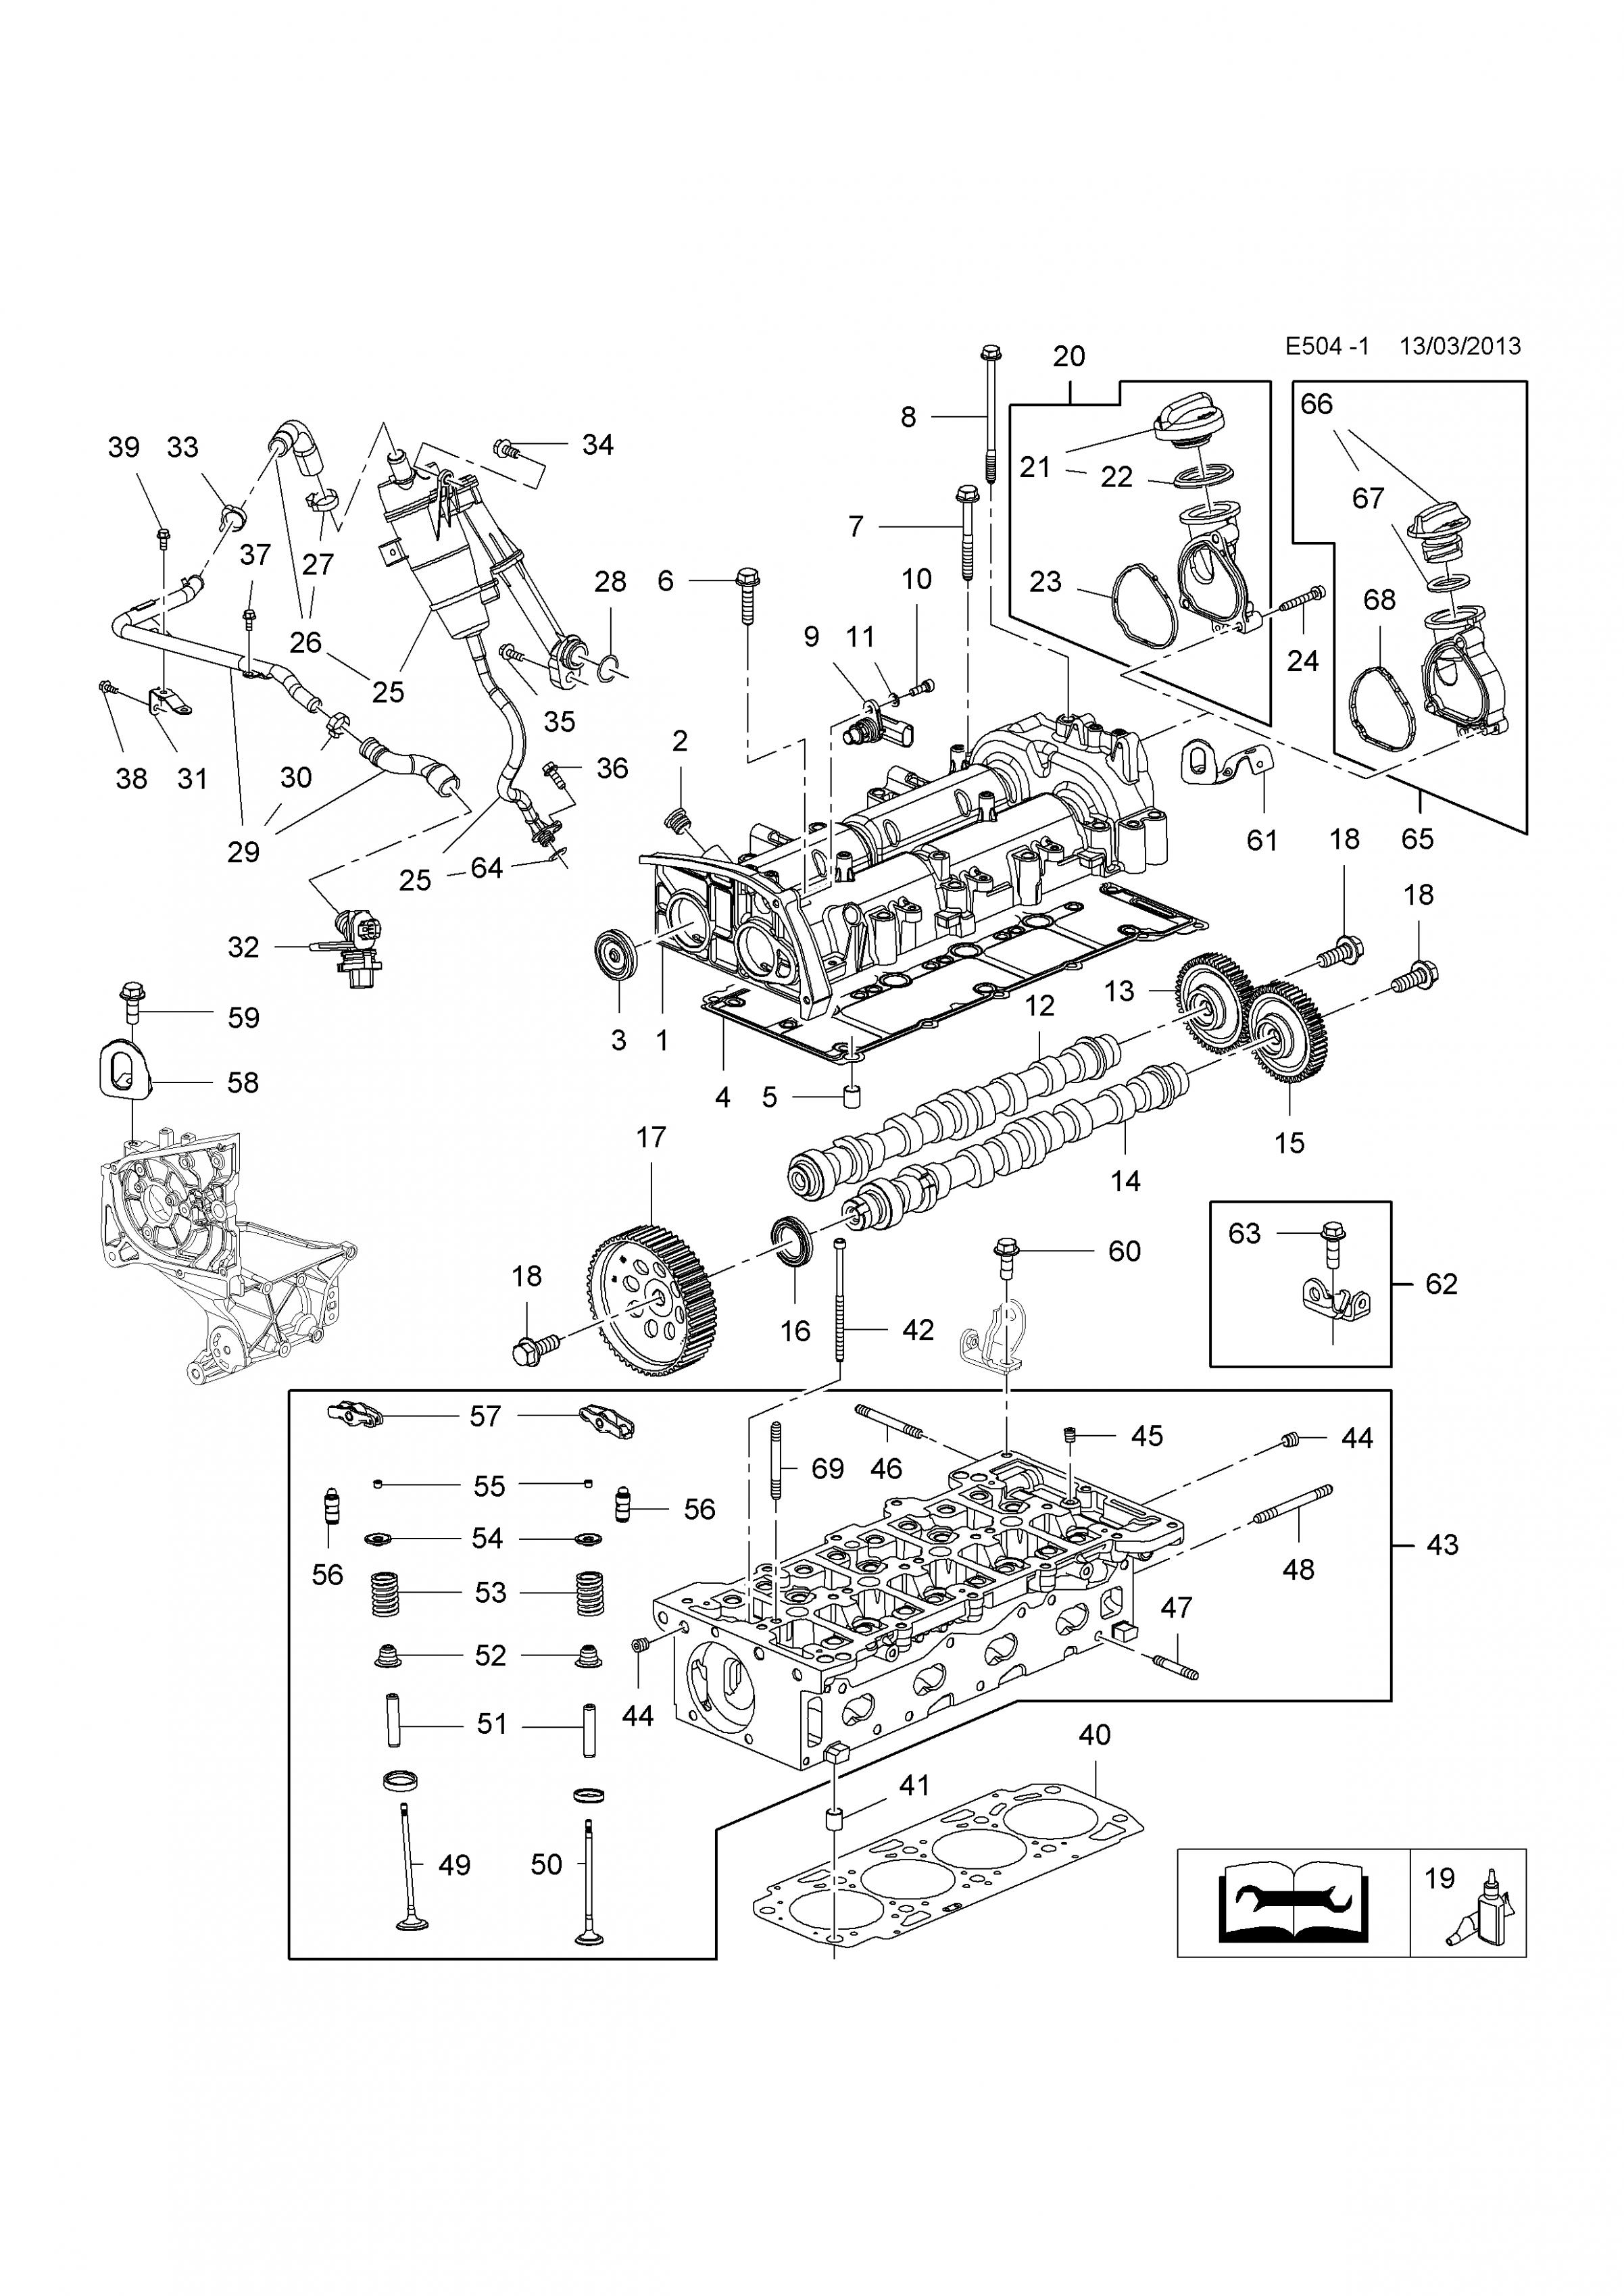 Towbar Wiring Diagram Vauxhall Insignia